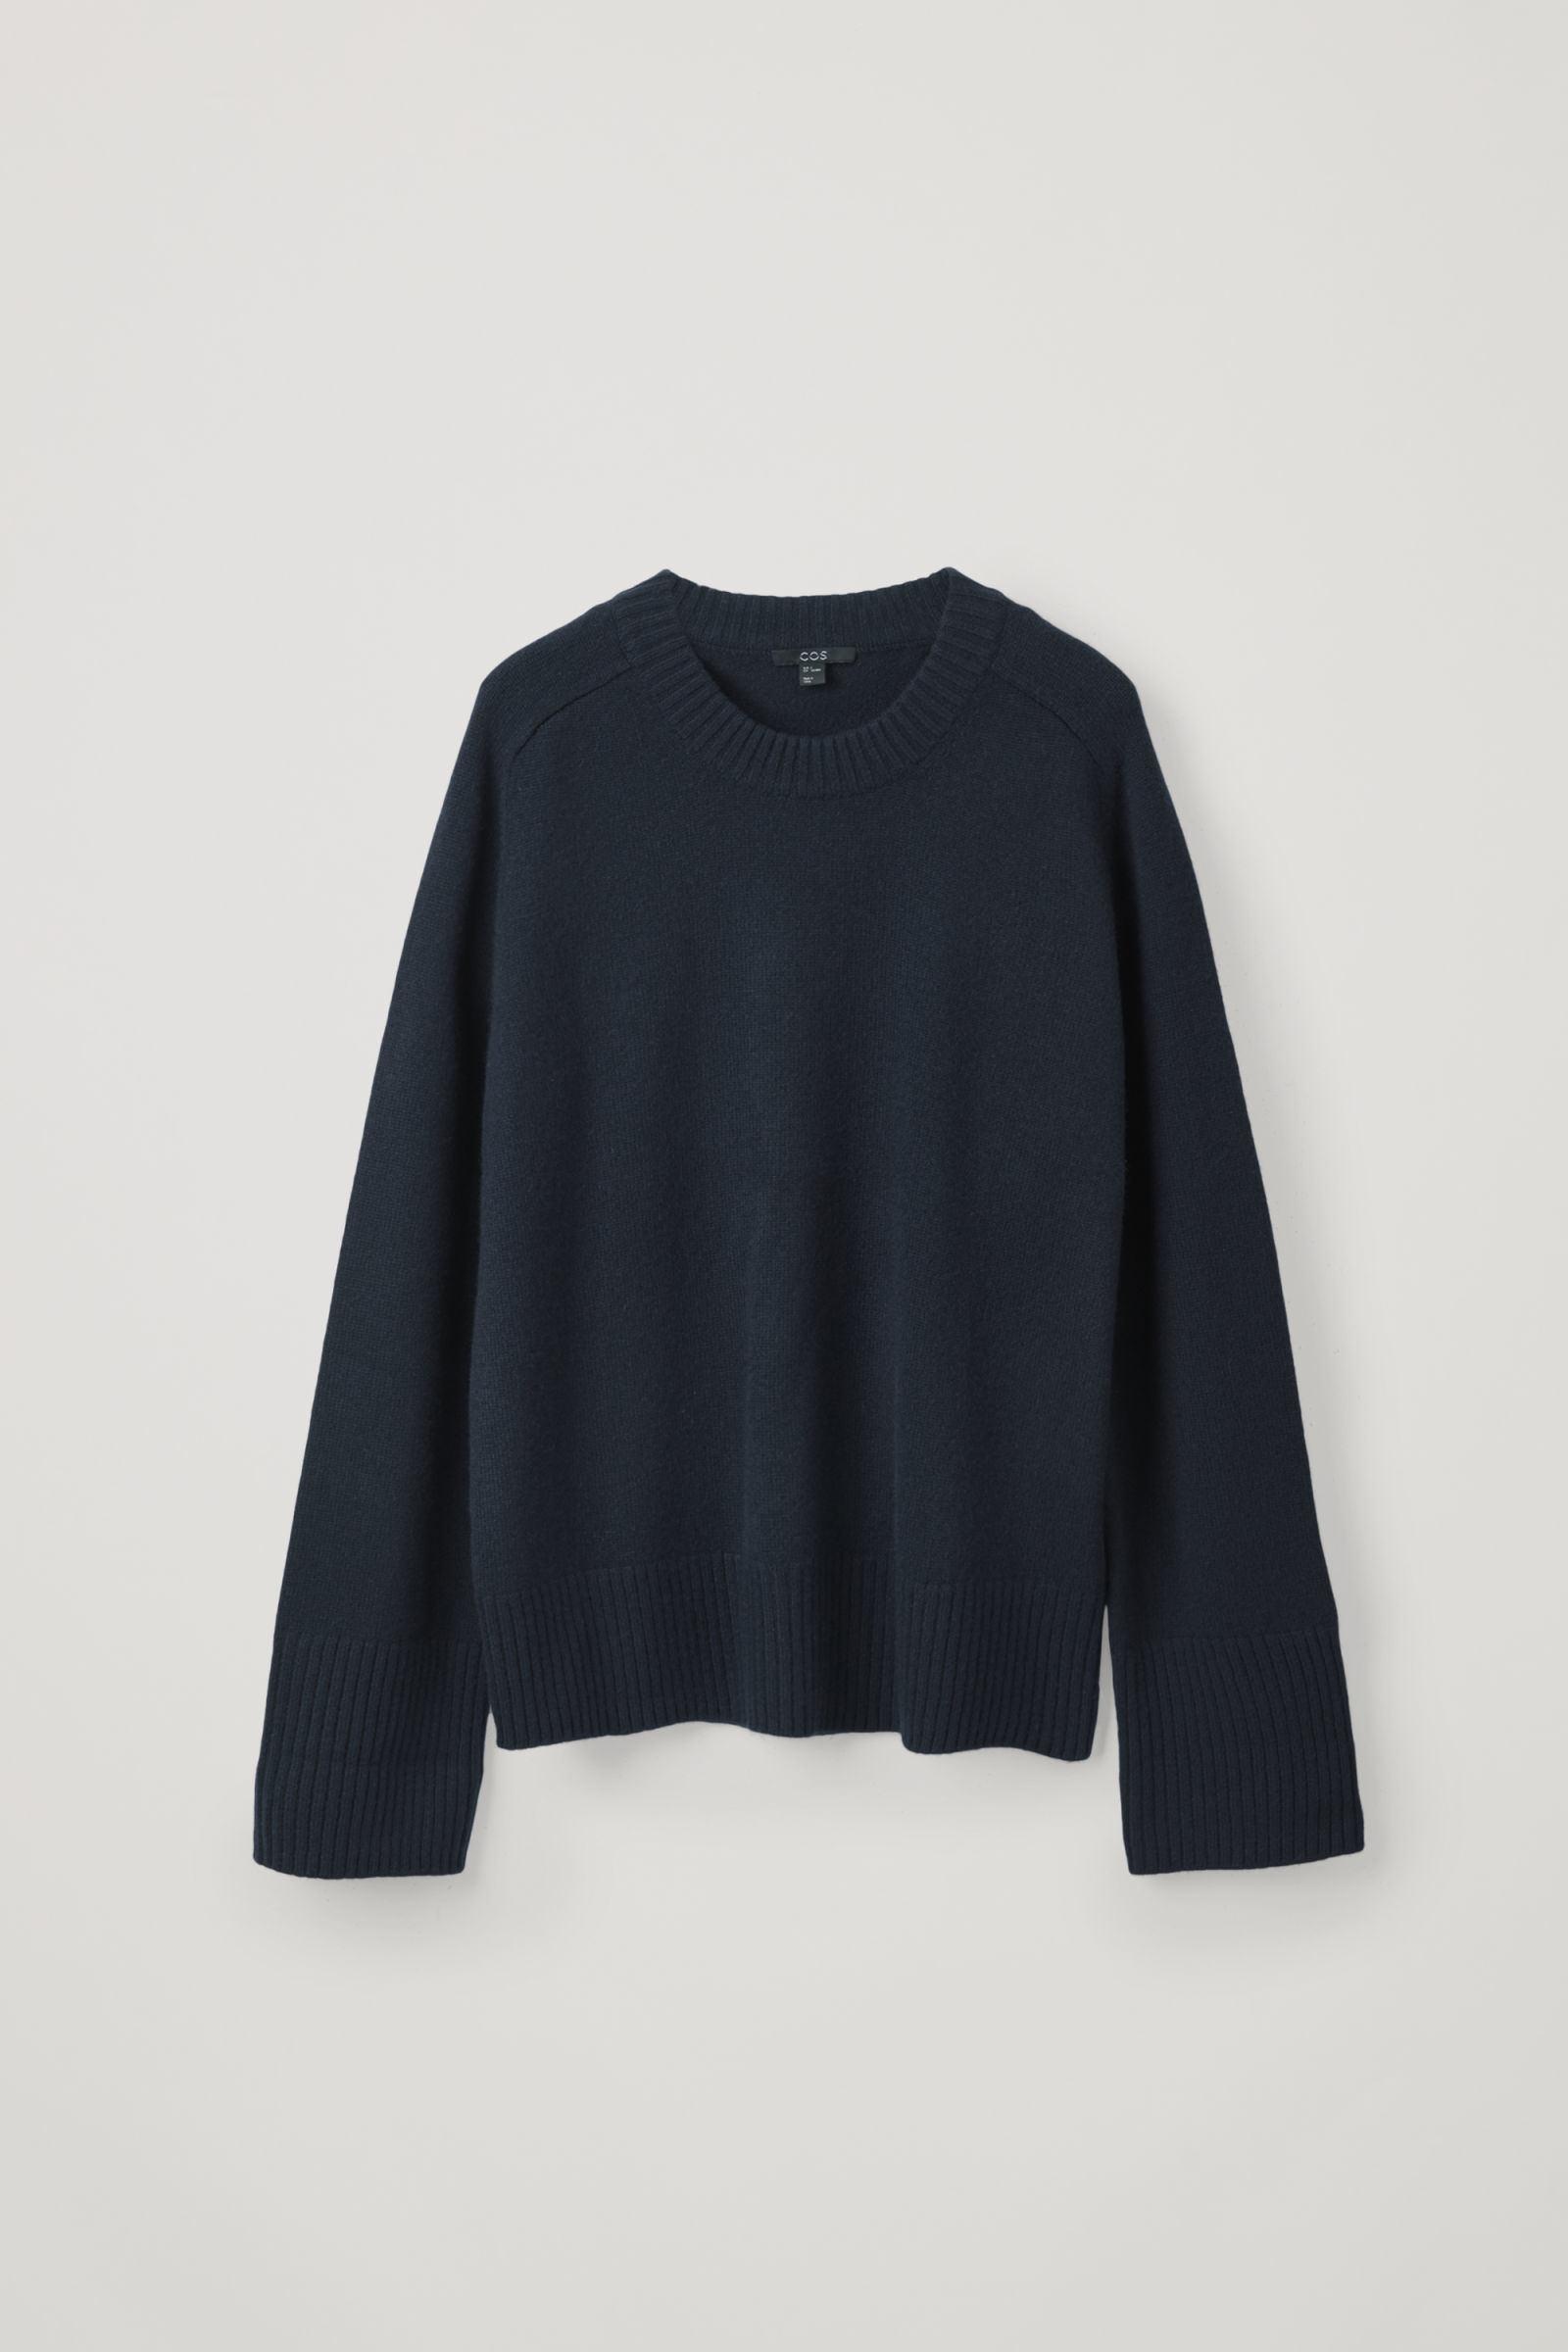 COS 리브 디테일 캐시미어 스웨터의 네이비컬러 Product입니다.